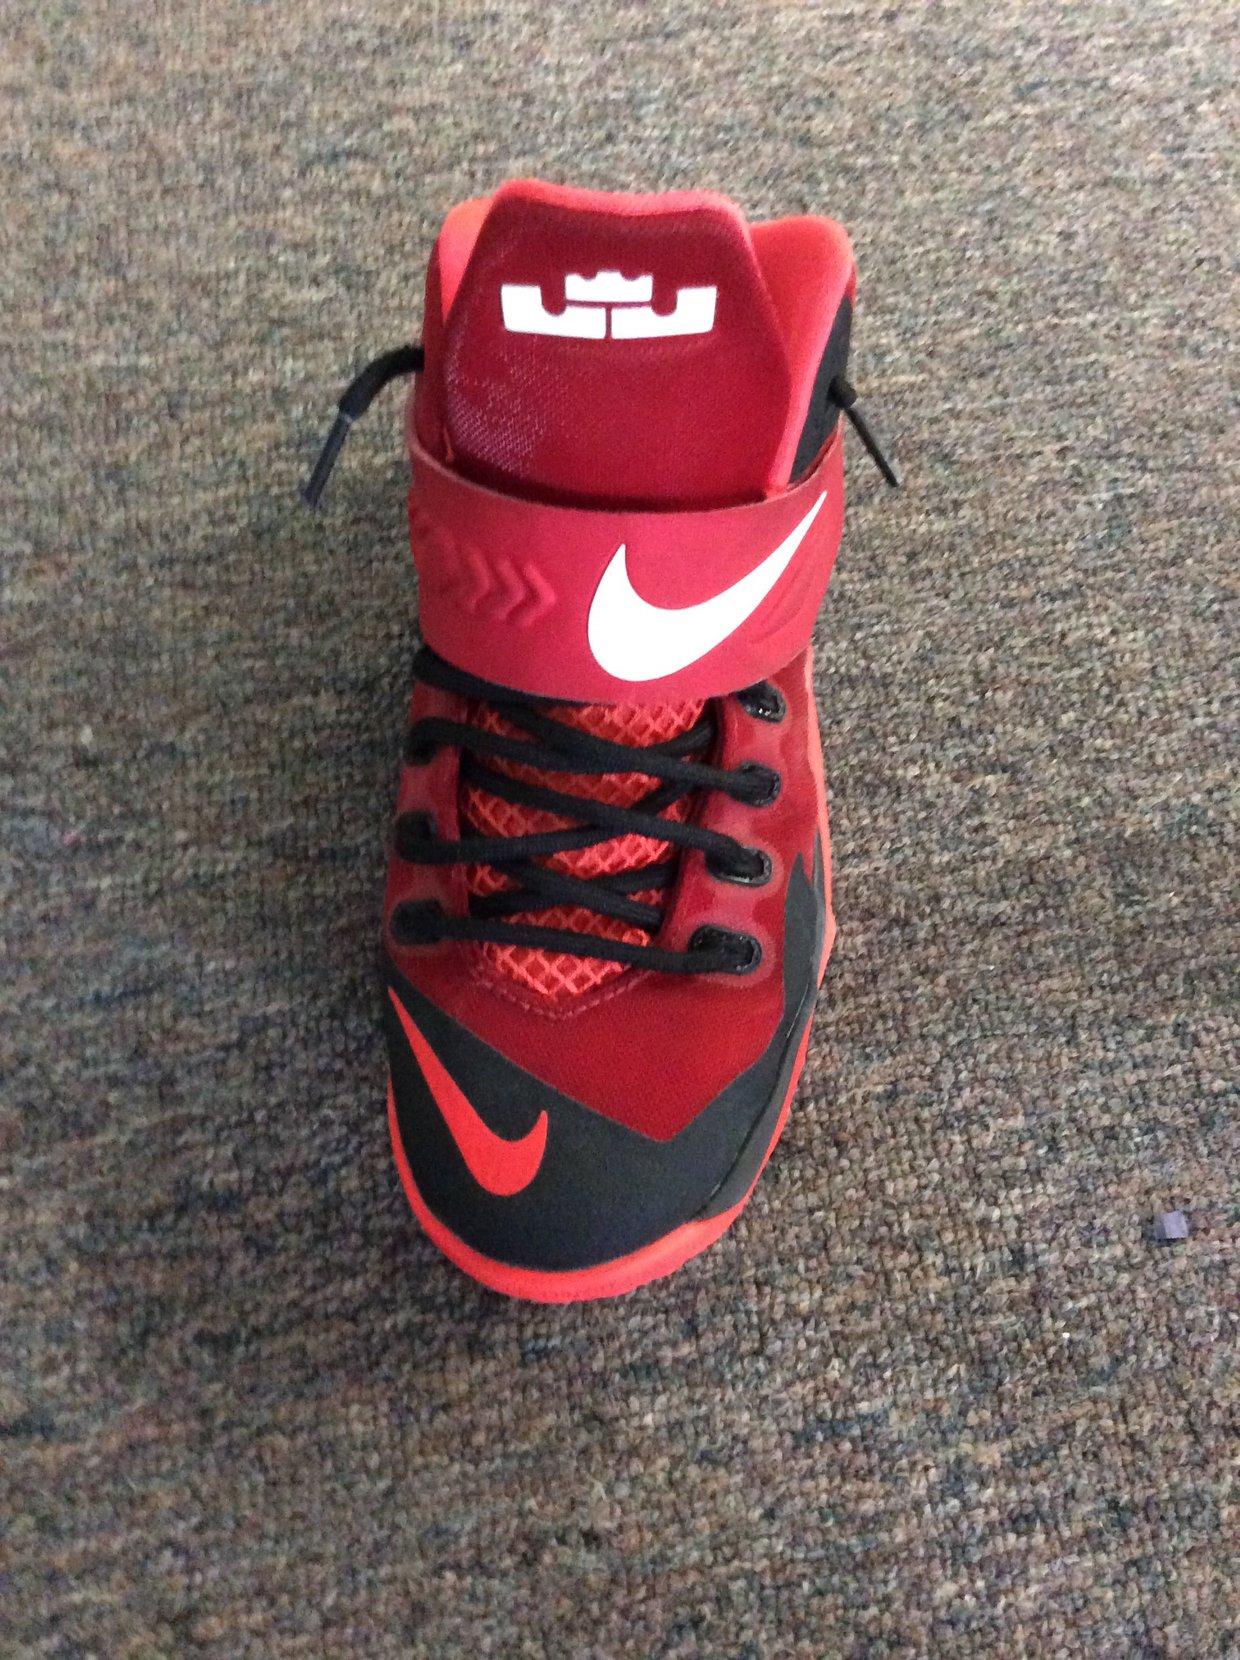 Lebron Jamess Symbol Nike Symbol Nike Mostly Makes At Thinglink